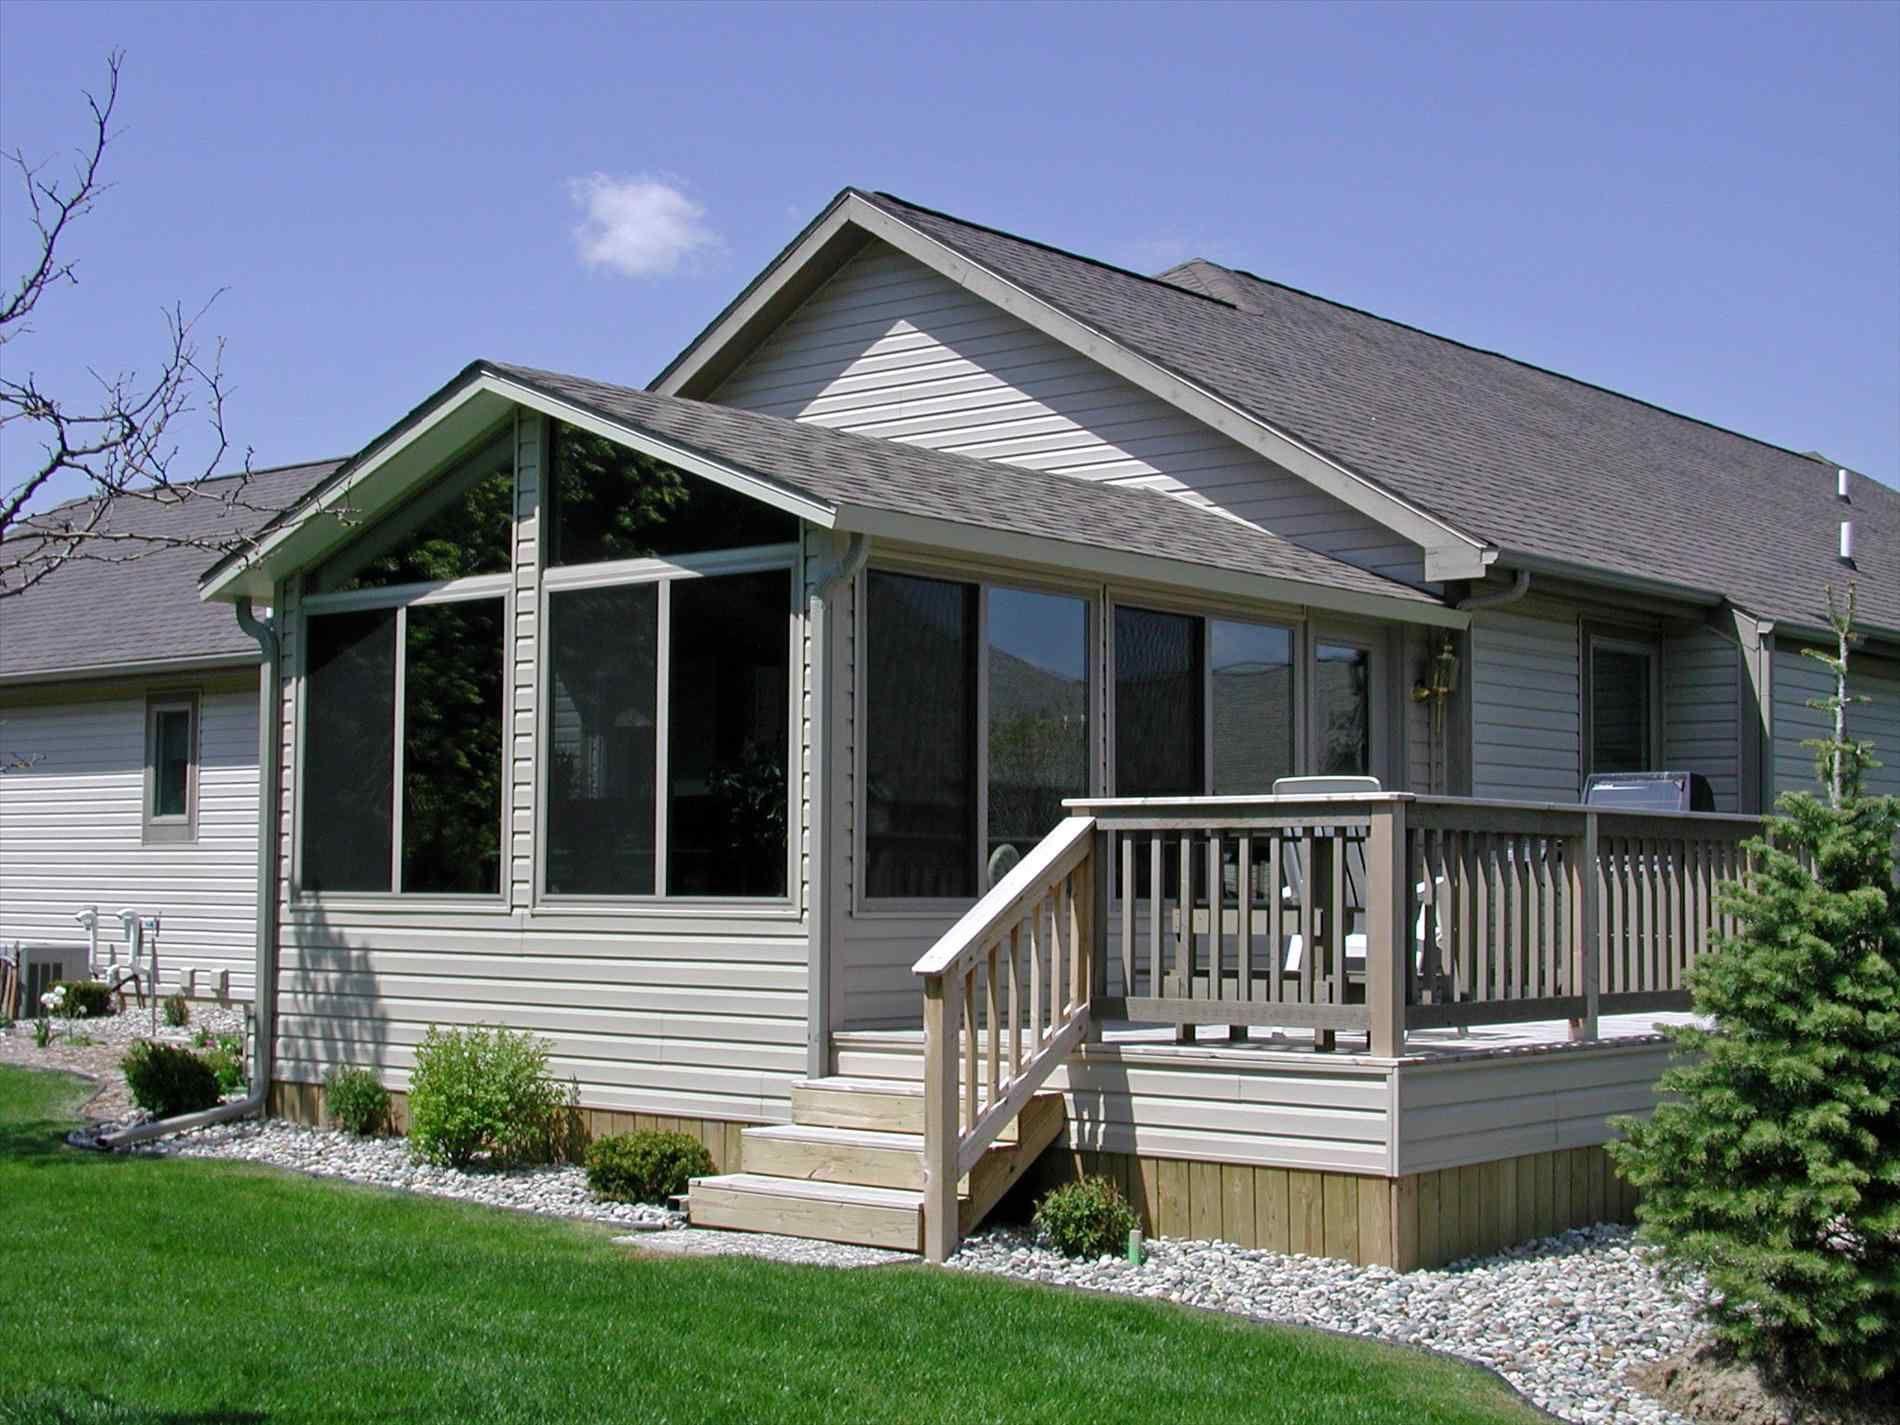 Sunroom Roof Ideas Home Roof Ideas Gable Roof House Gable House Roof Design